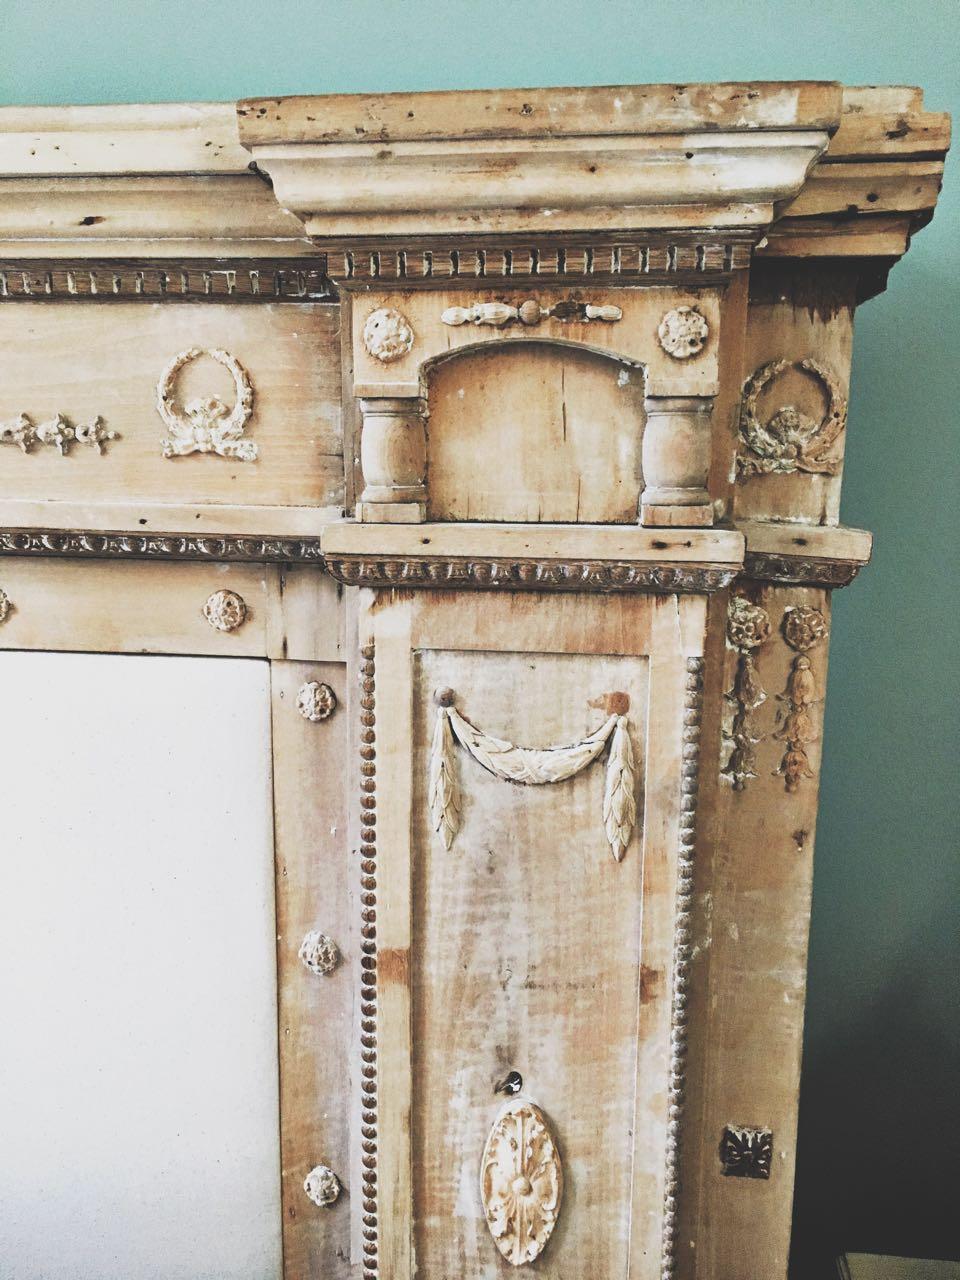 Mantel fireplace as Master bedroom headboard